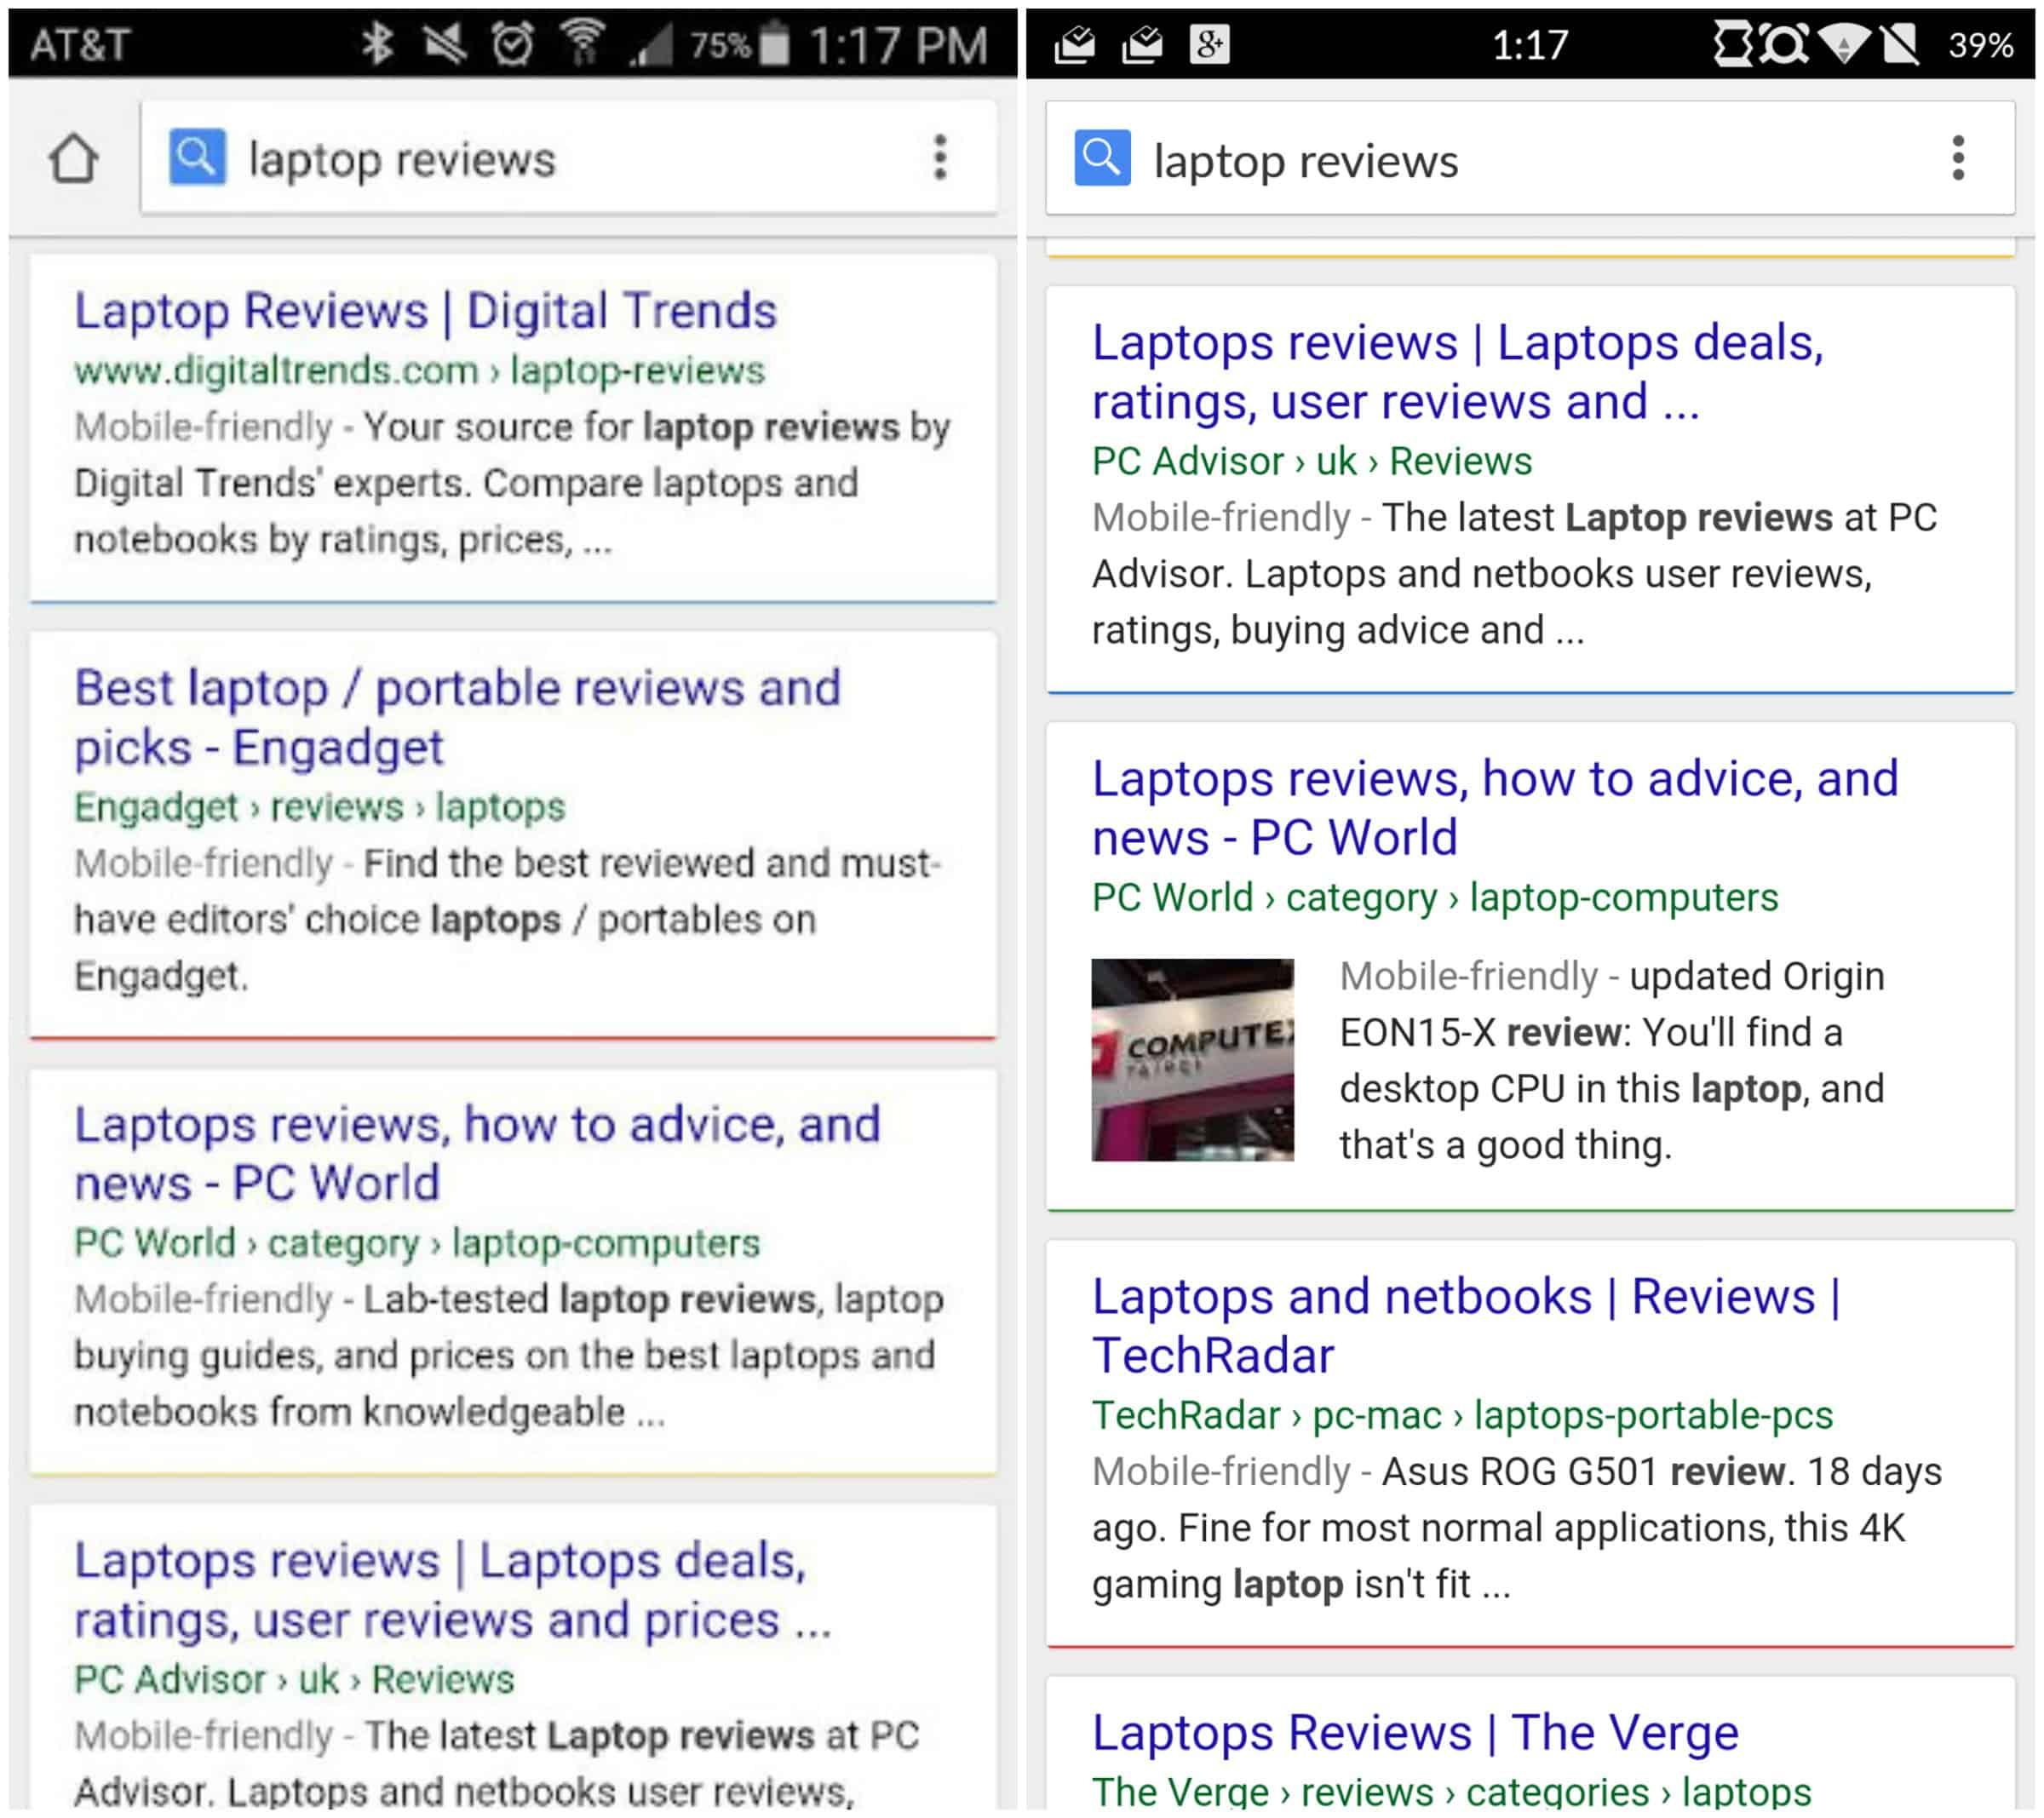 Googl search results